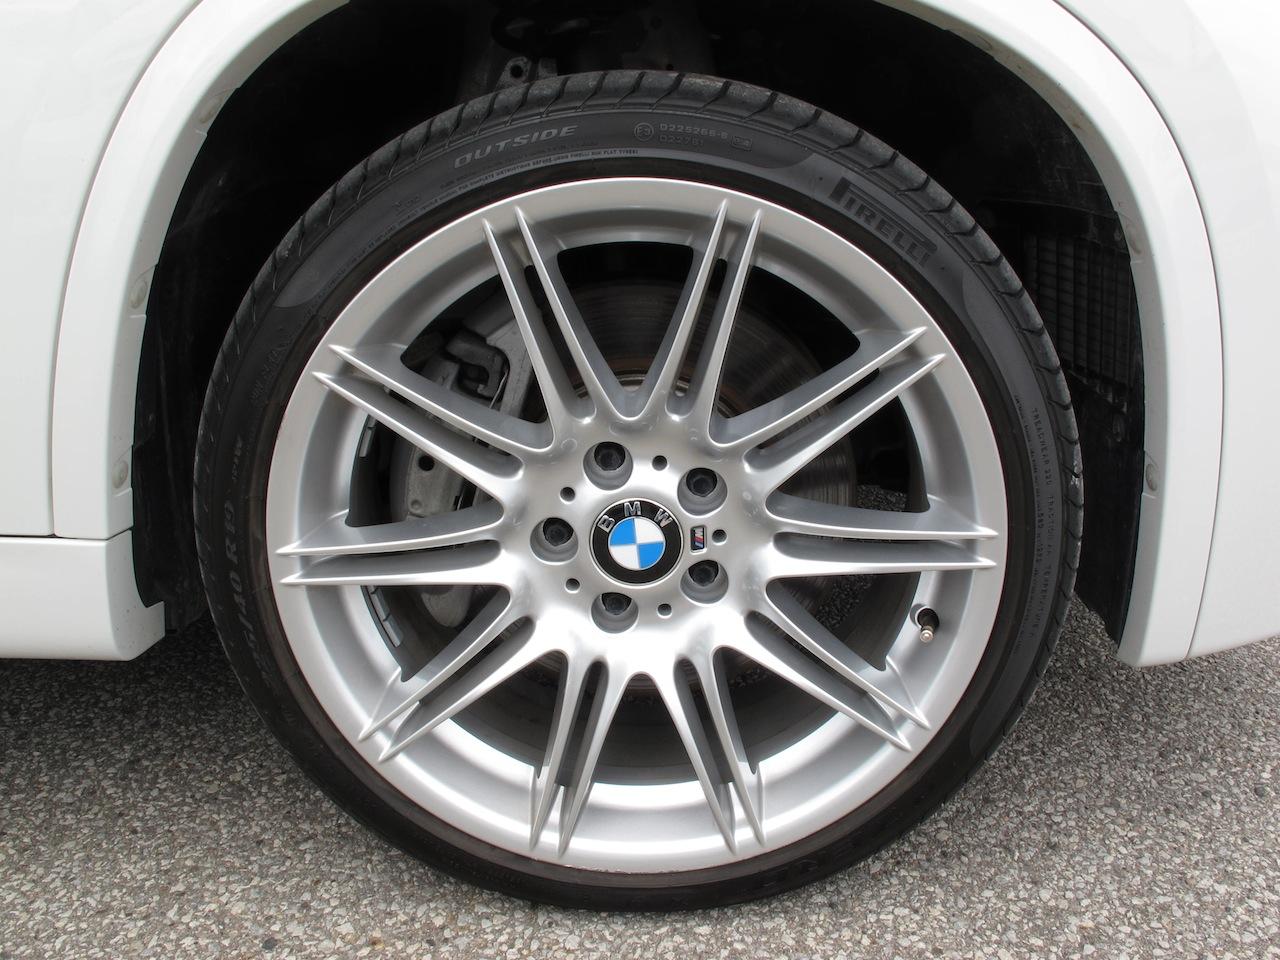 2013 Bmw X1 Xdrive35i M Sport Review Cars Photos Test